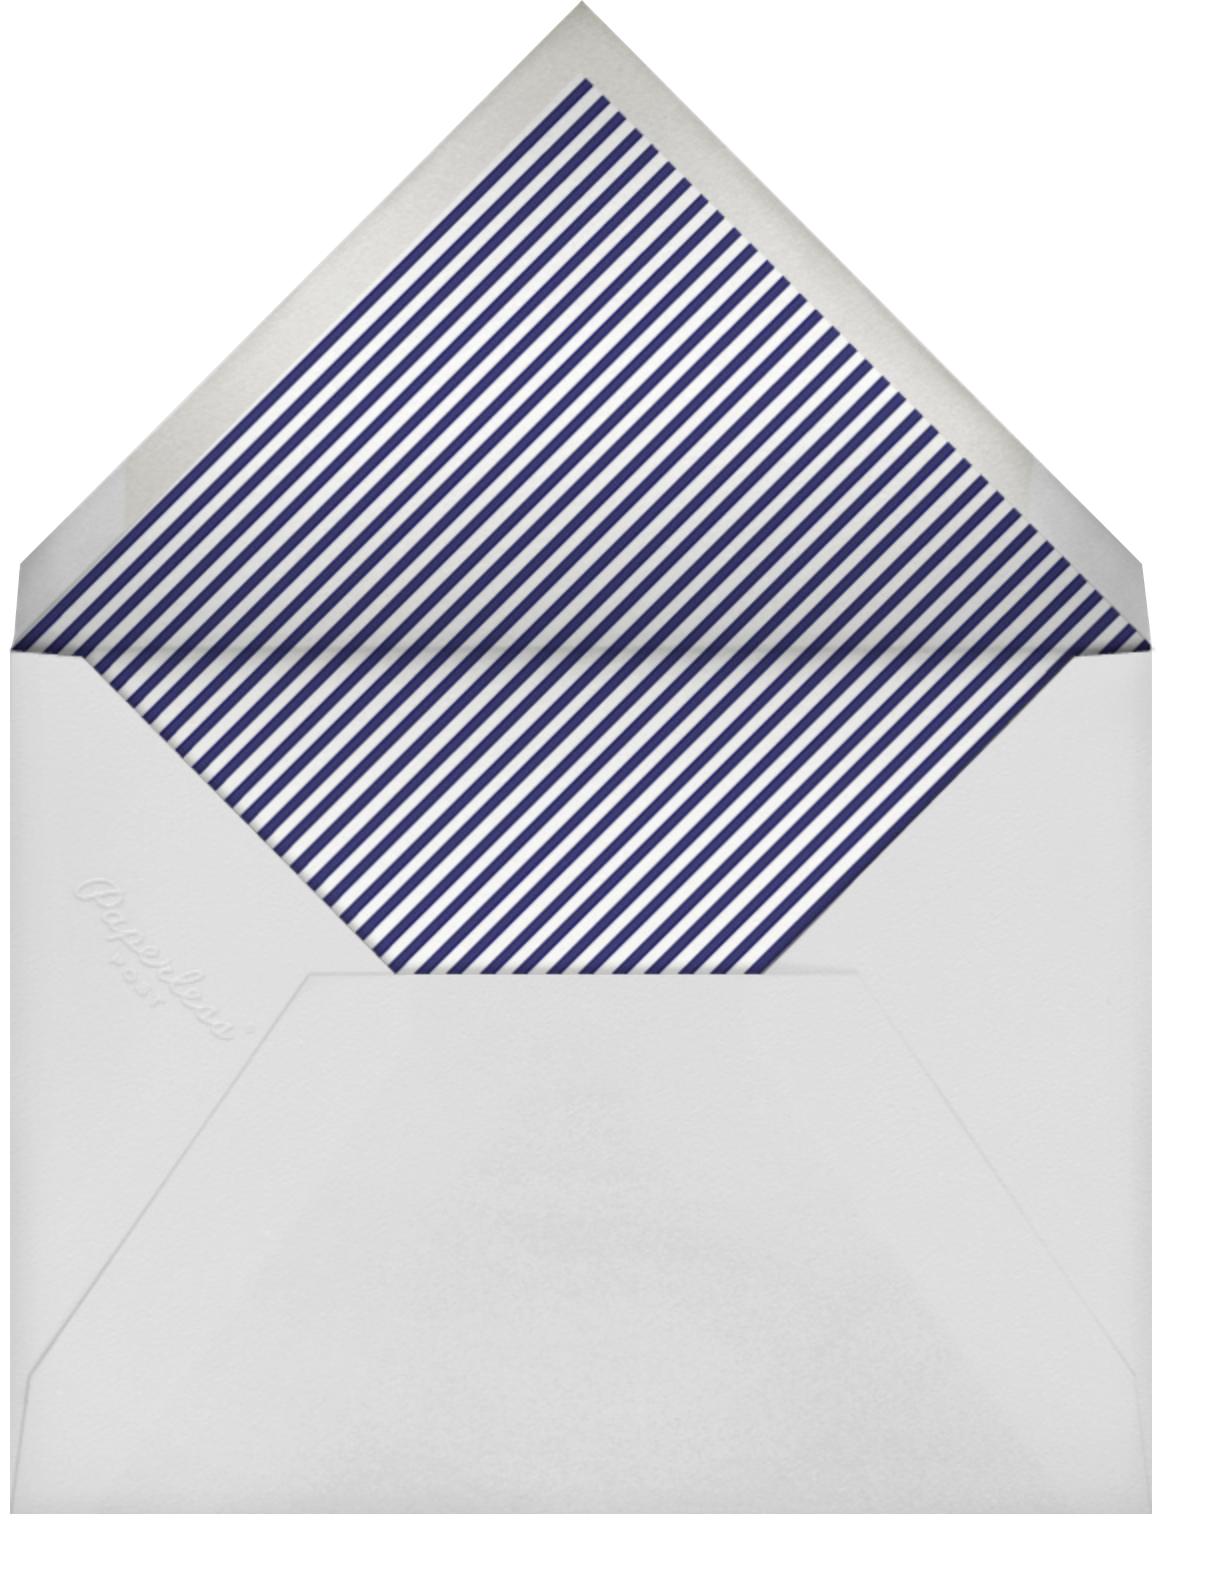 Sweden in the Summer - Blue - Mr. Boddington's Studio - Baby shower - envelope back